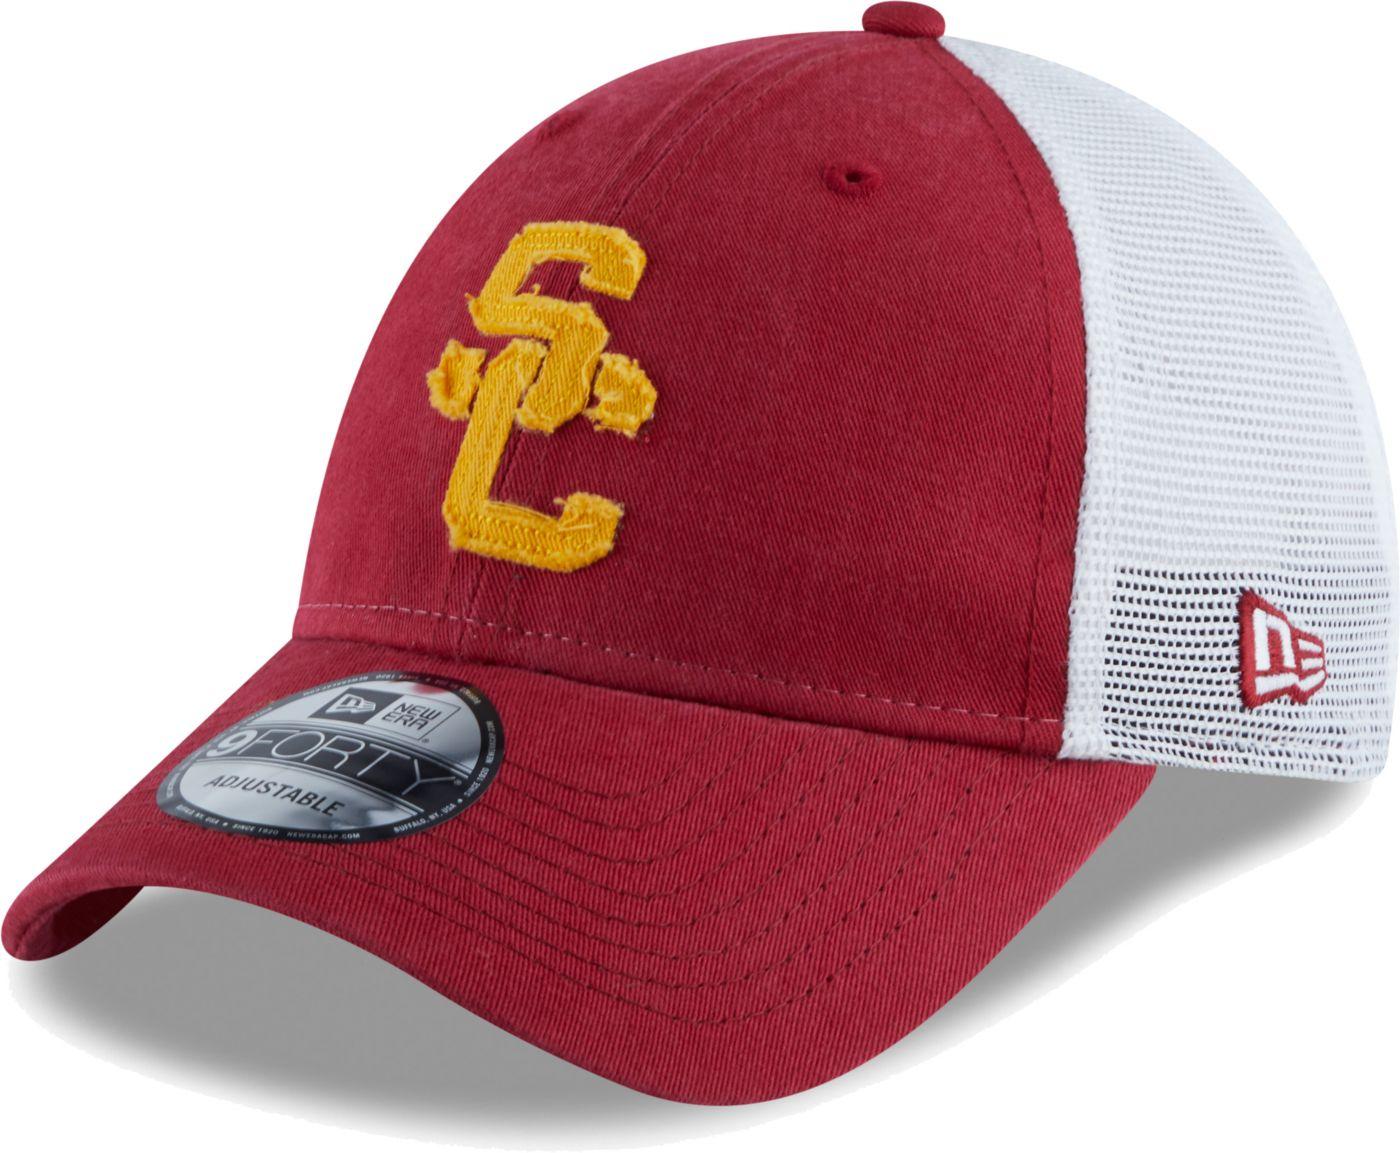 New Era Men's USC Trojans Cardinal Meshback Hat